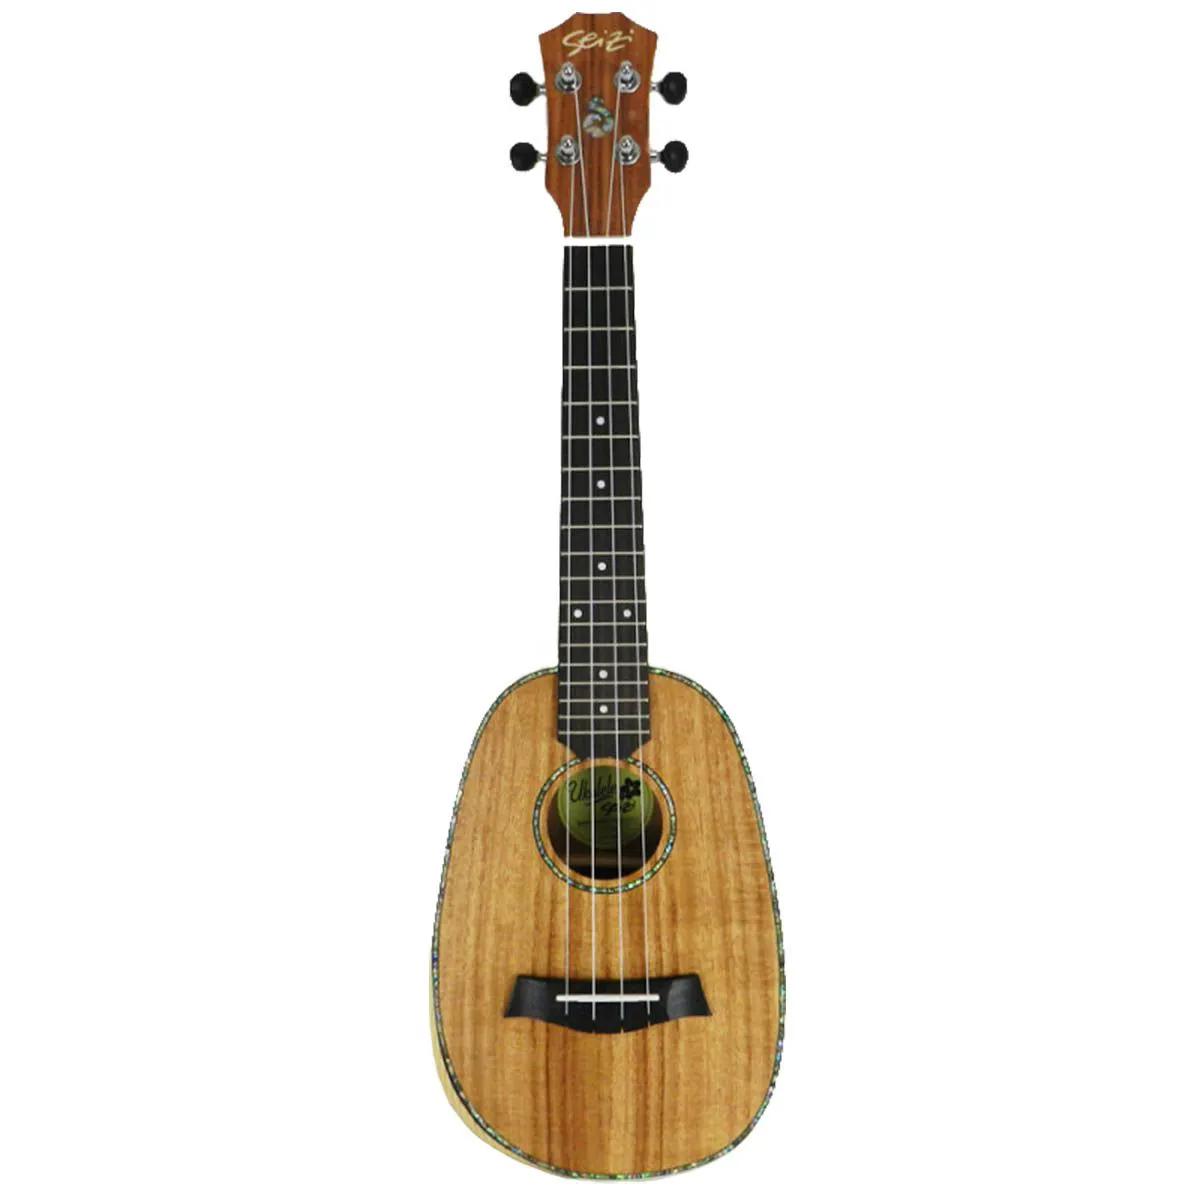 Ukulele Elétrico Seizi Bora-Bora Pineapple Concert Koa